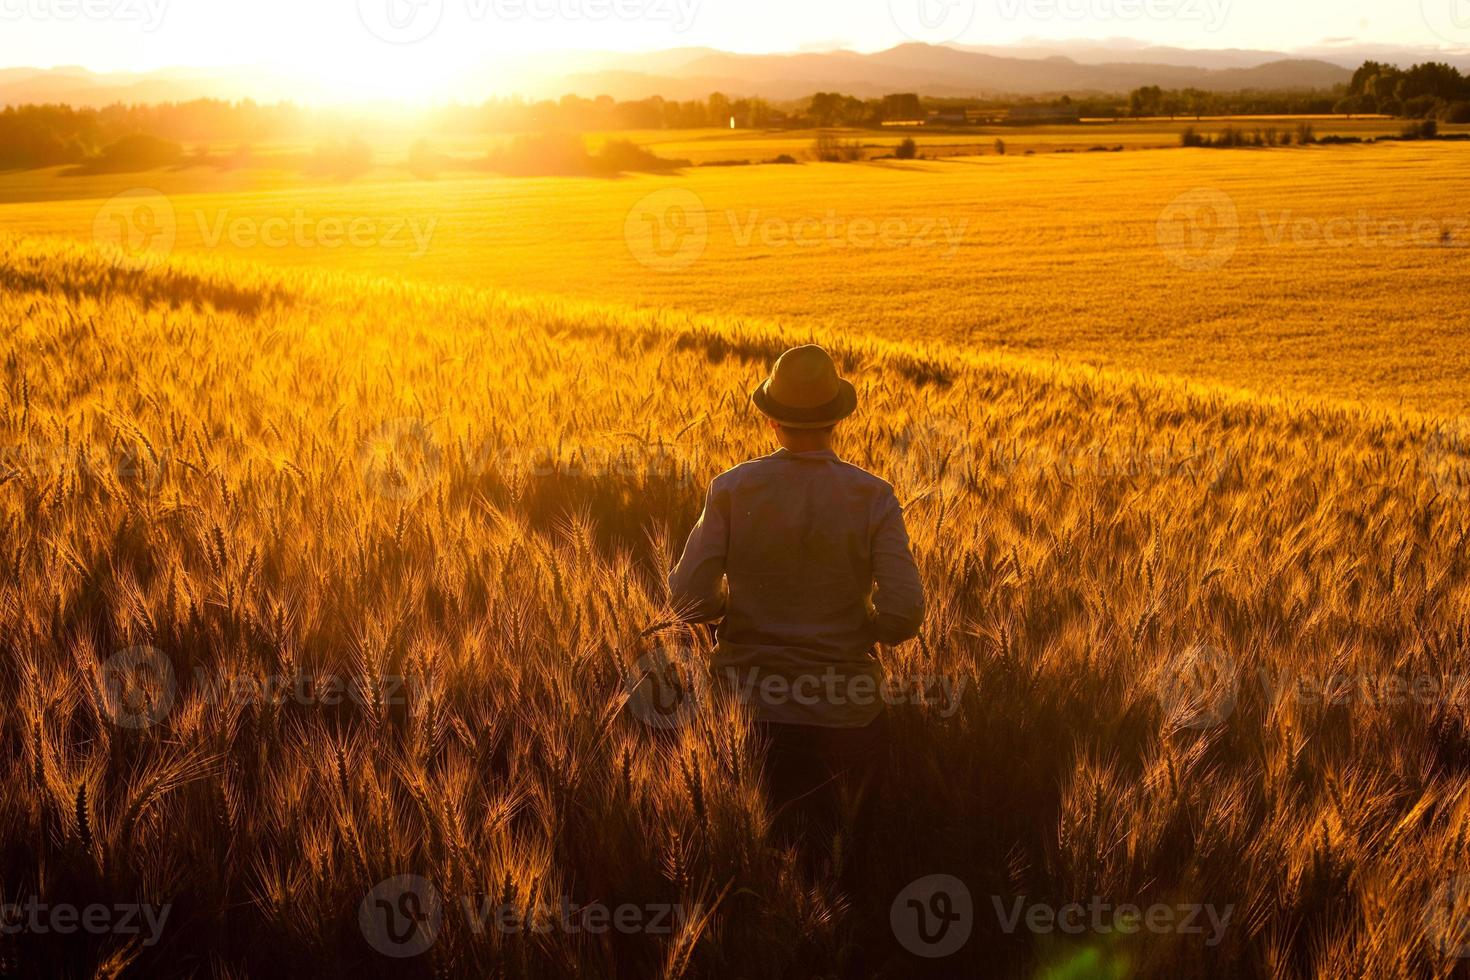 Feld stehender junger erwachsener Mann beobachtet Sonnenuntergang in Frieden foto